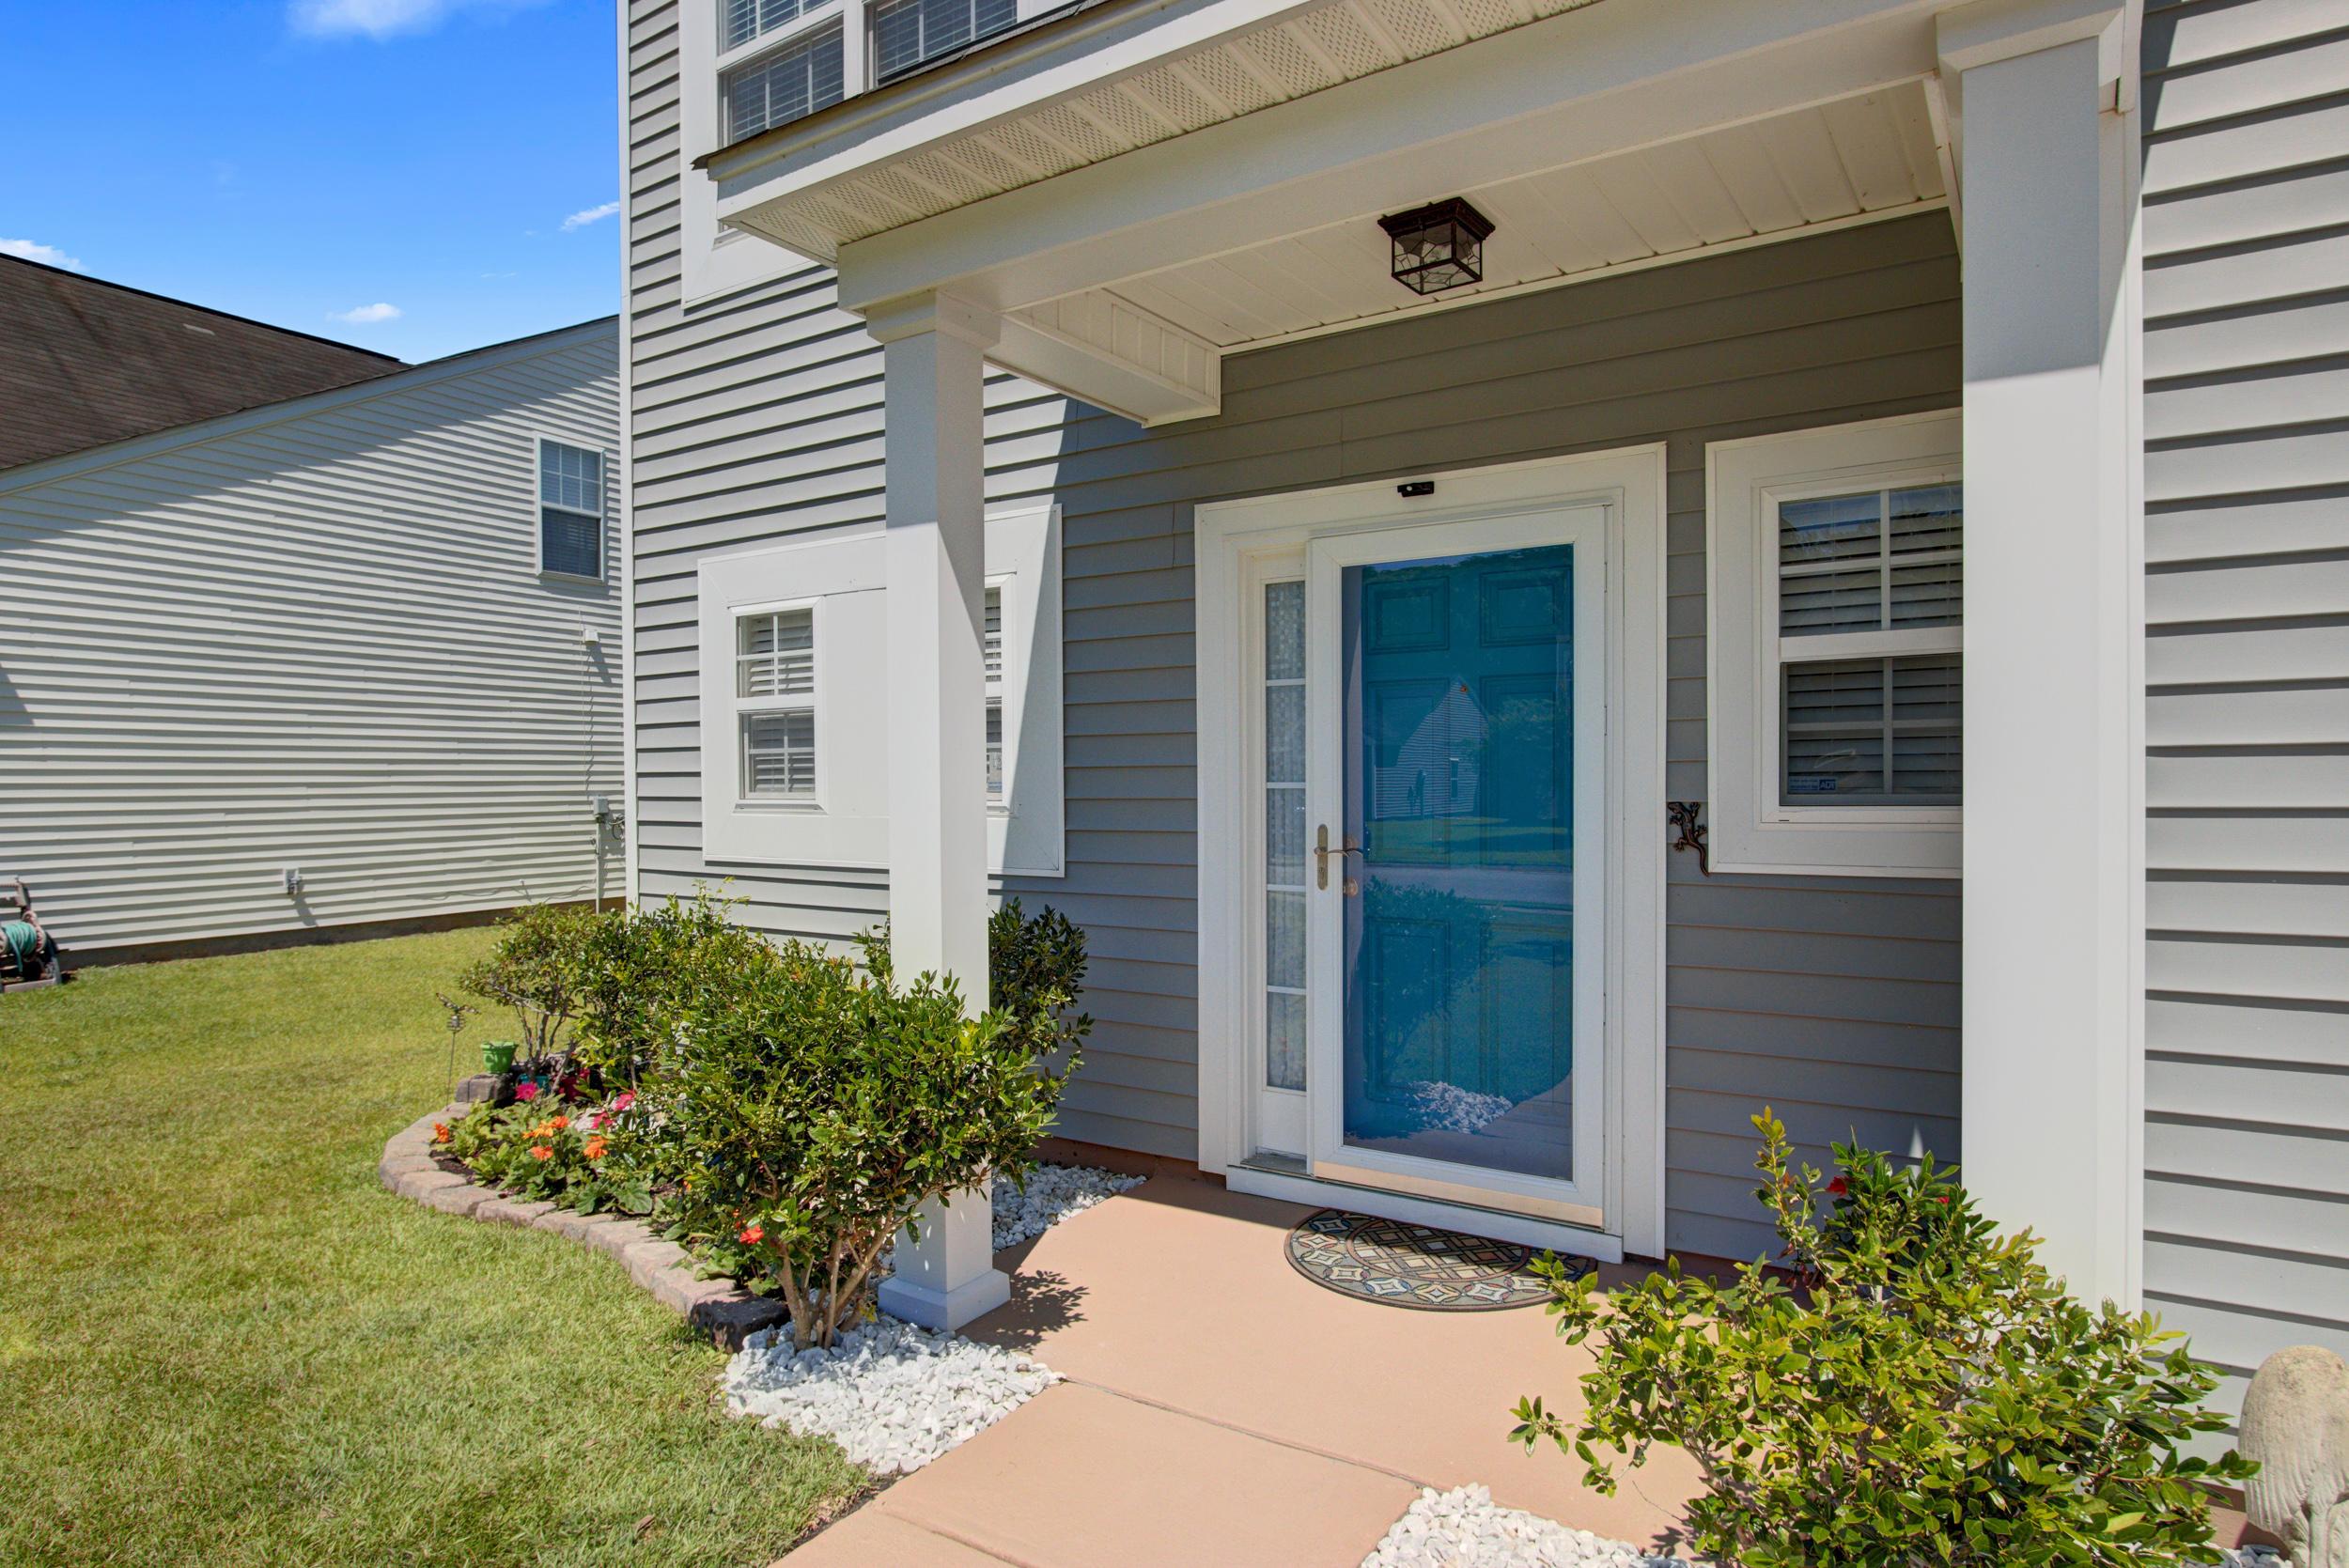 Oakley Pointe Homes For Sale - 576 English Oak, Moncks Corner, SC - 58